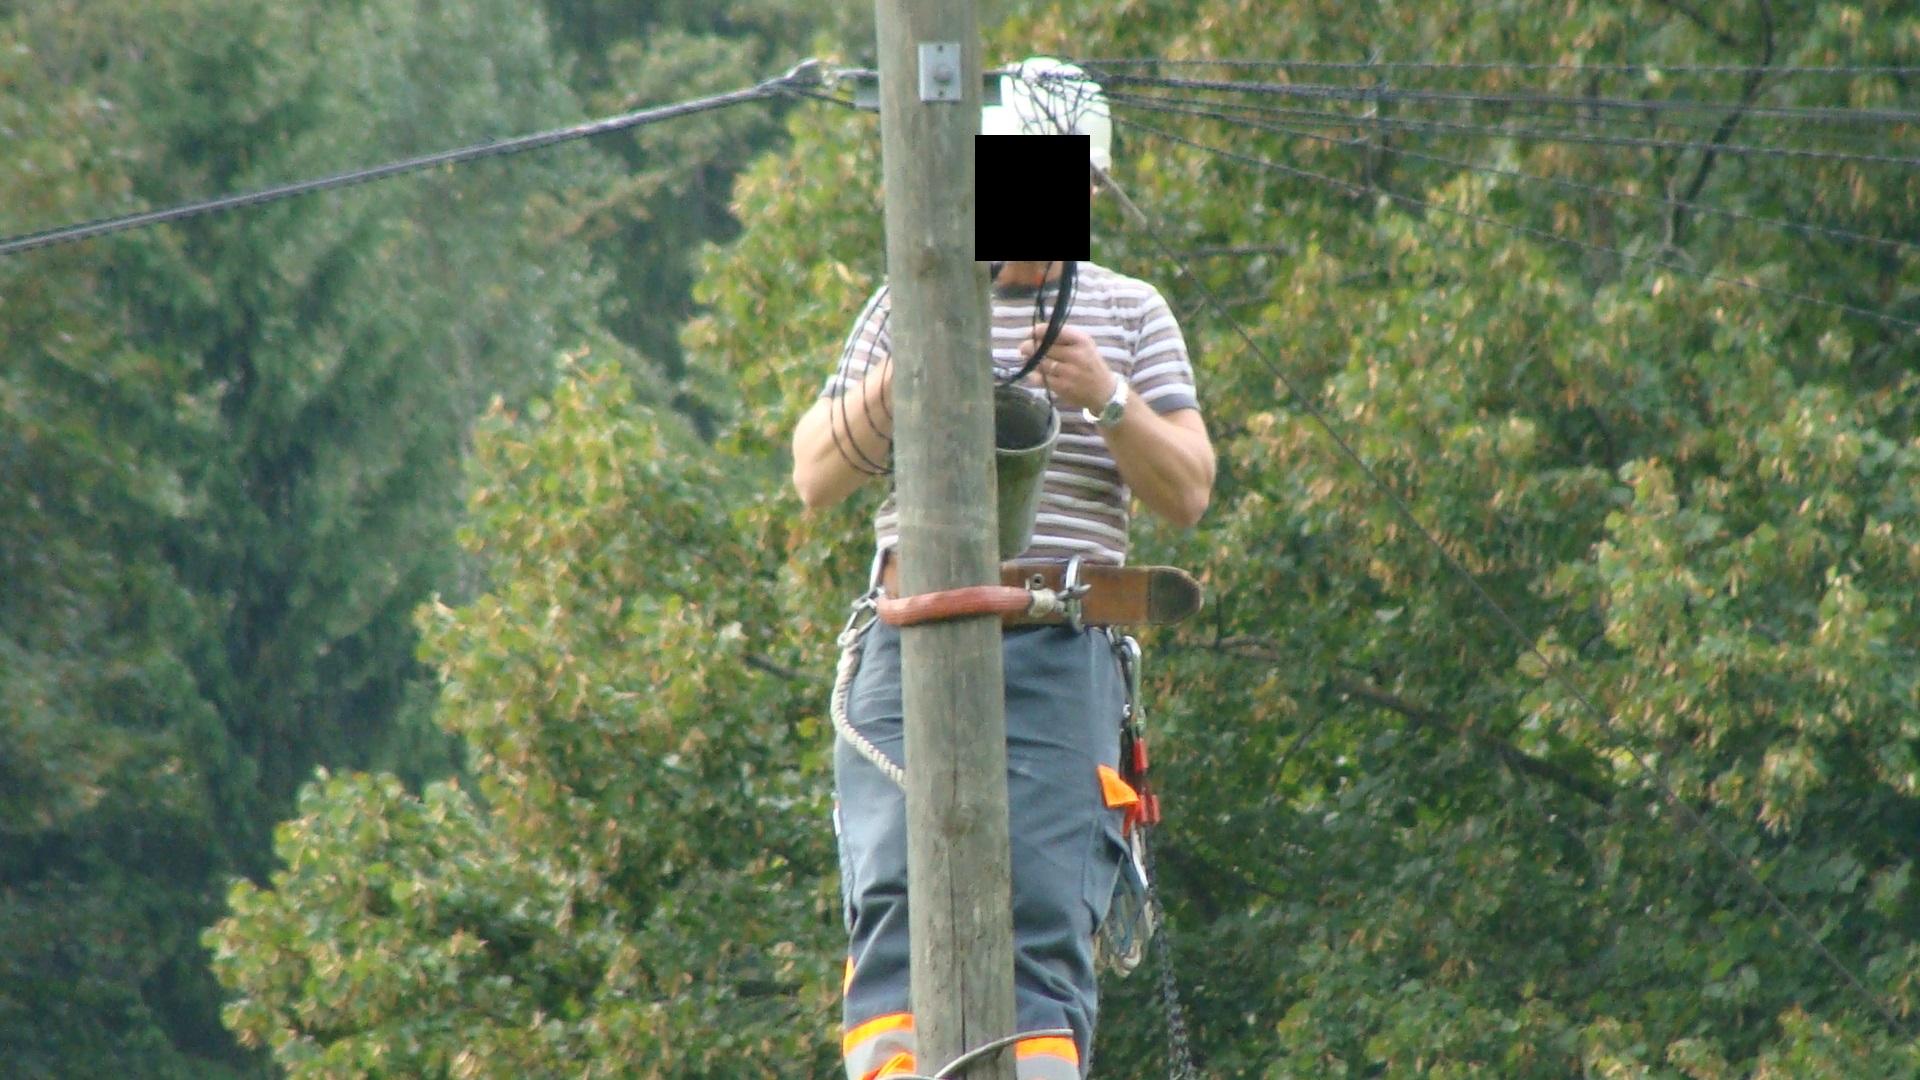 Telefon-Freileitungsmonteur am 23.09.2016 in Mitholz